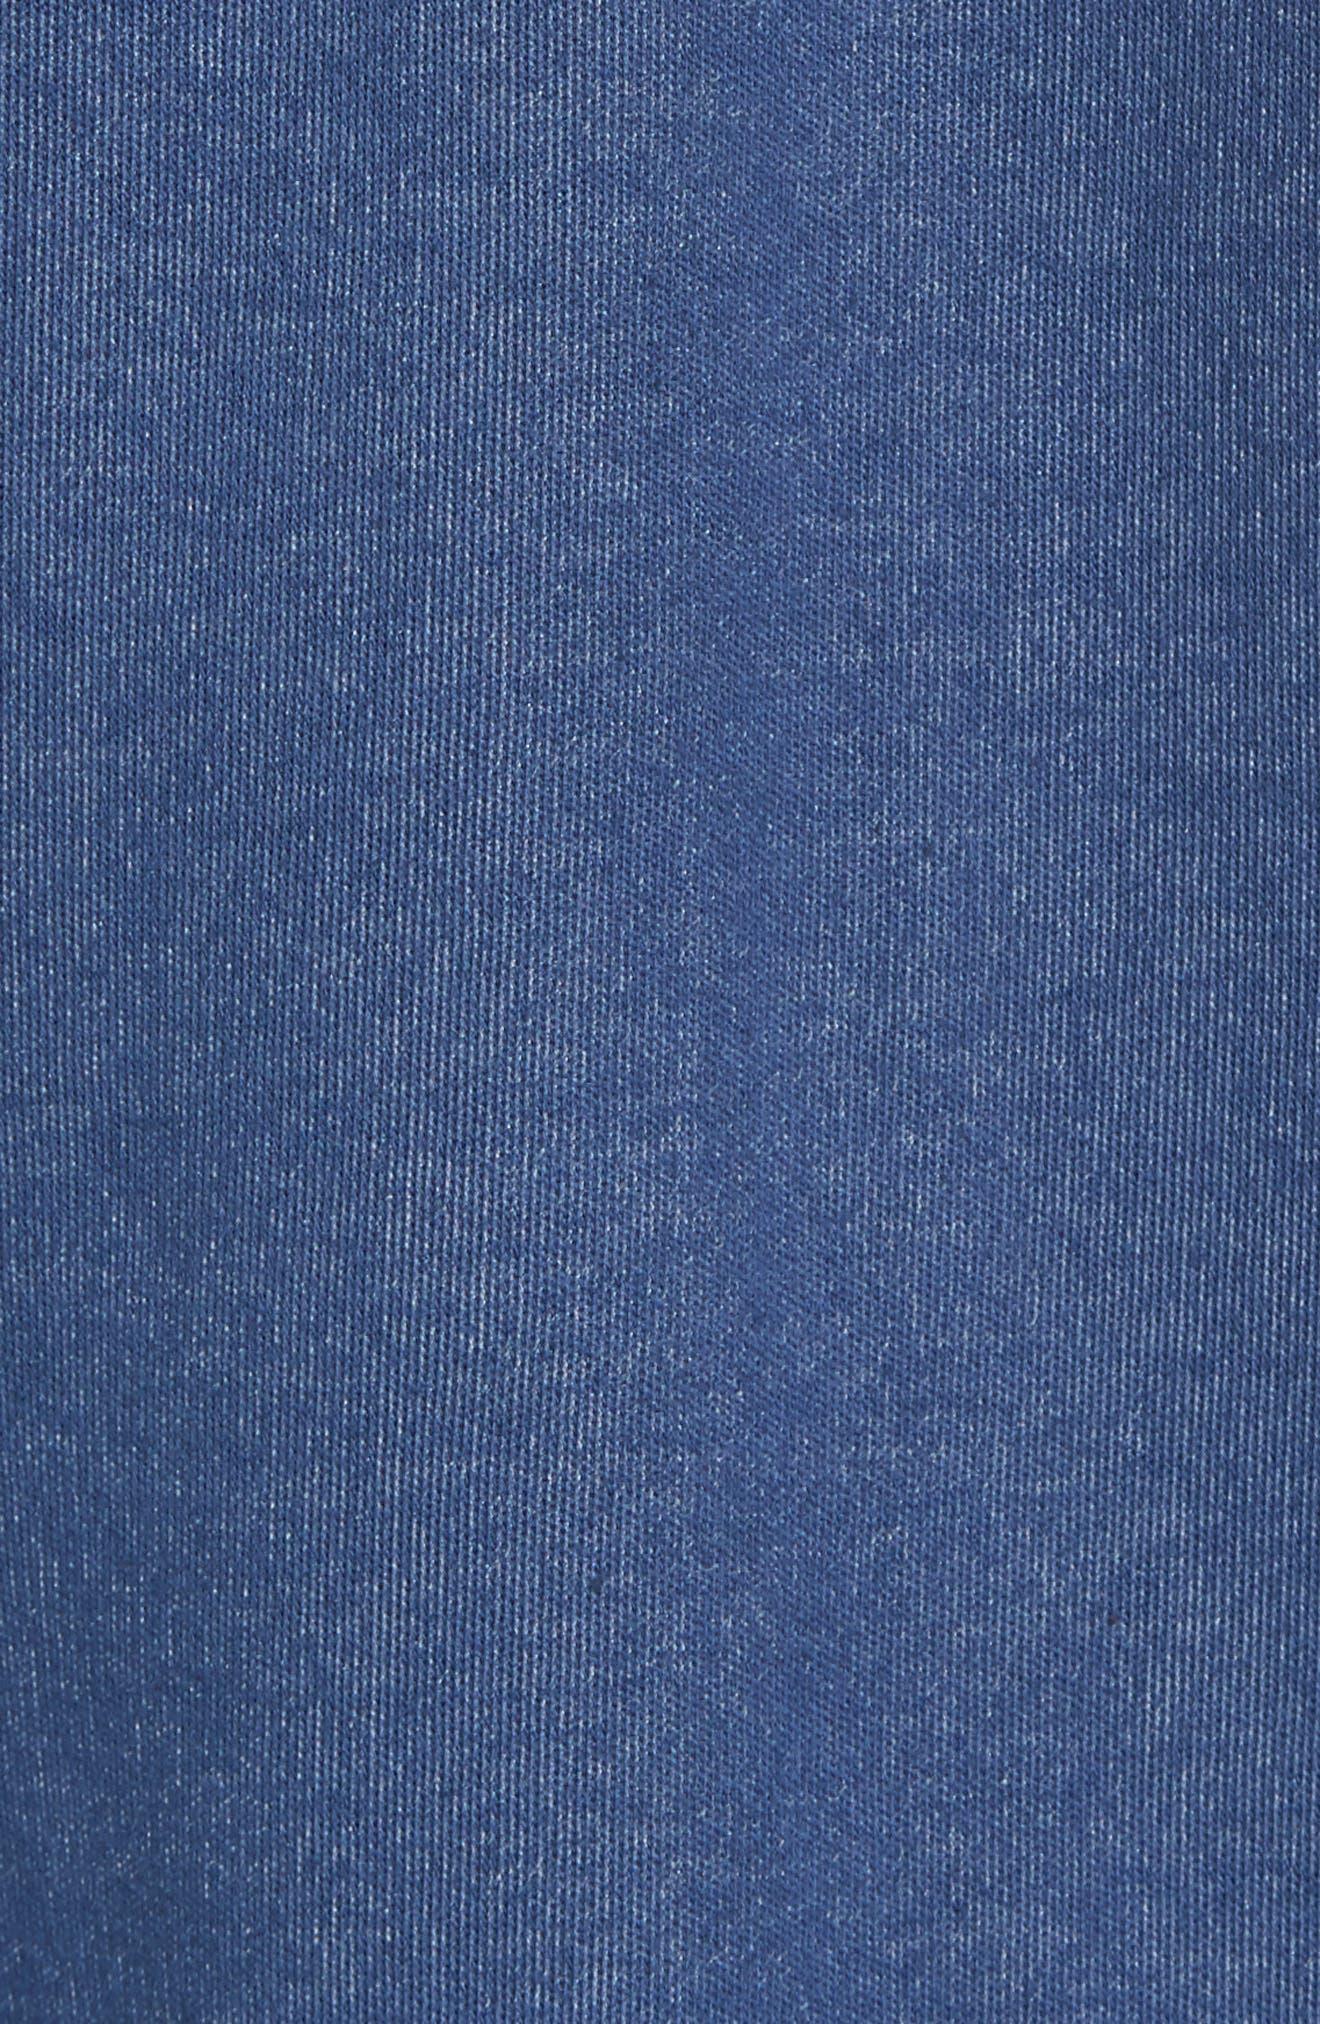 Upper Deck Half Zip Pullover,                             Alternate thumbnail 5, color,                             410